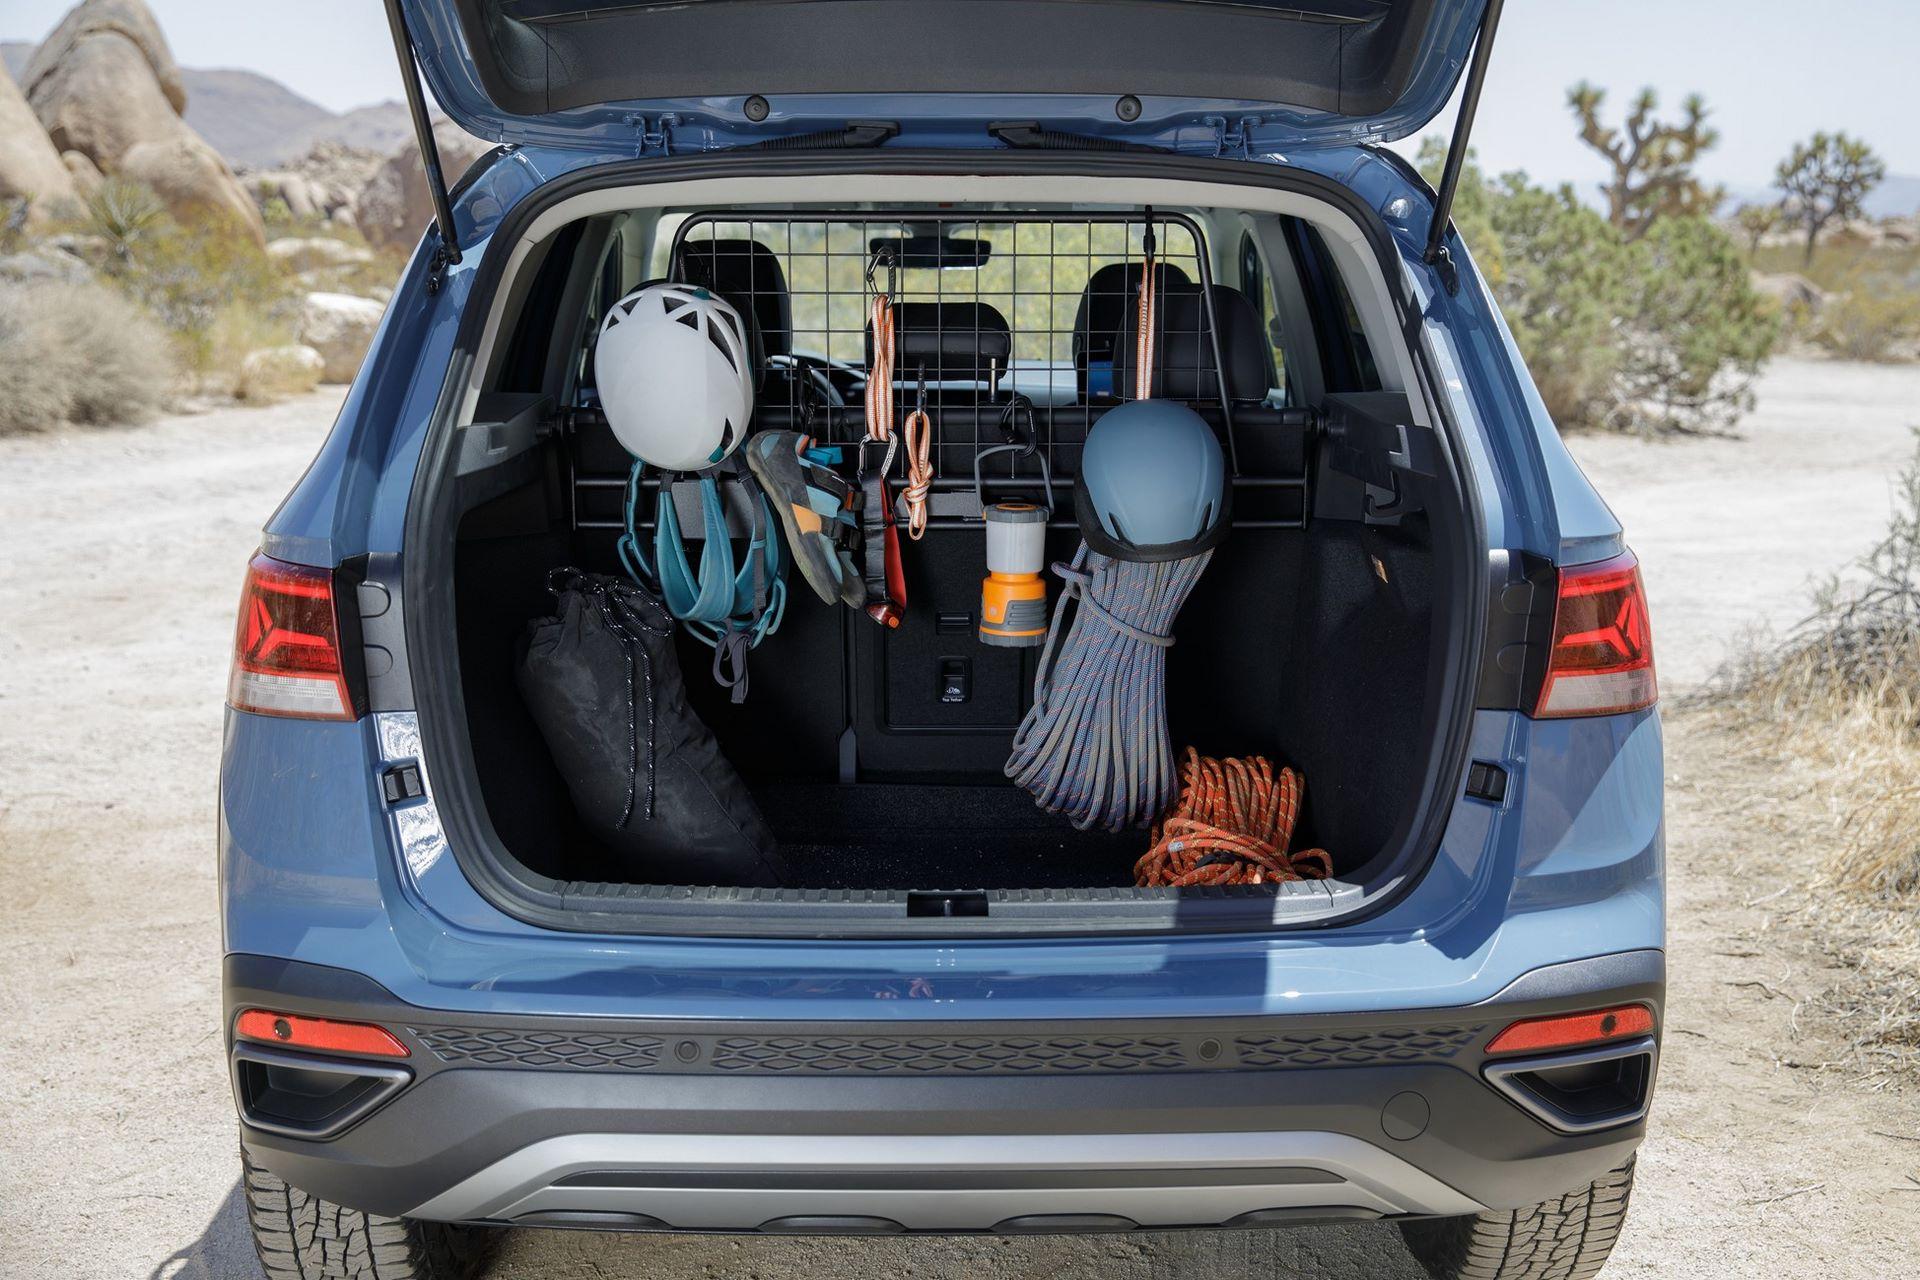 Volkswagen-Taos-Basecamp-concept-8